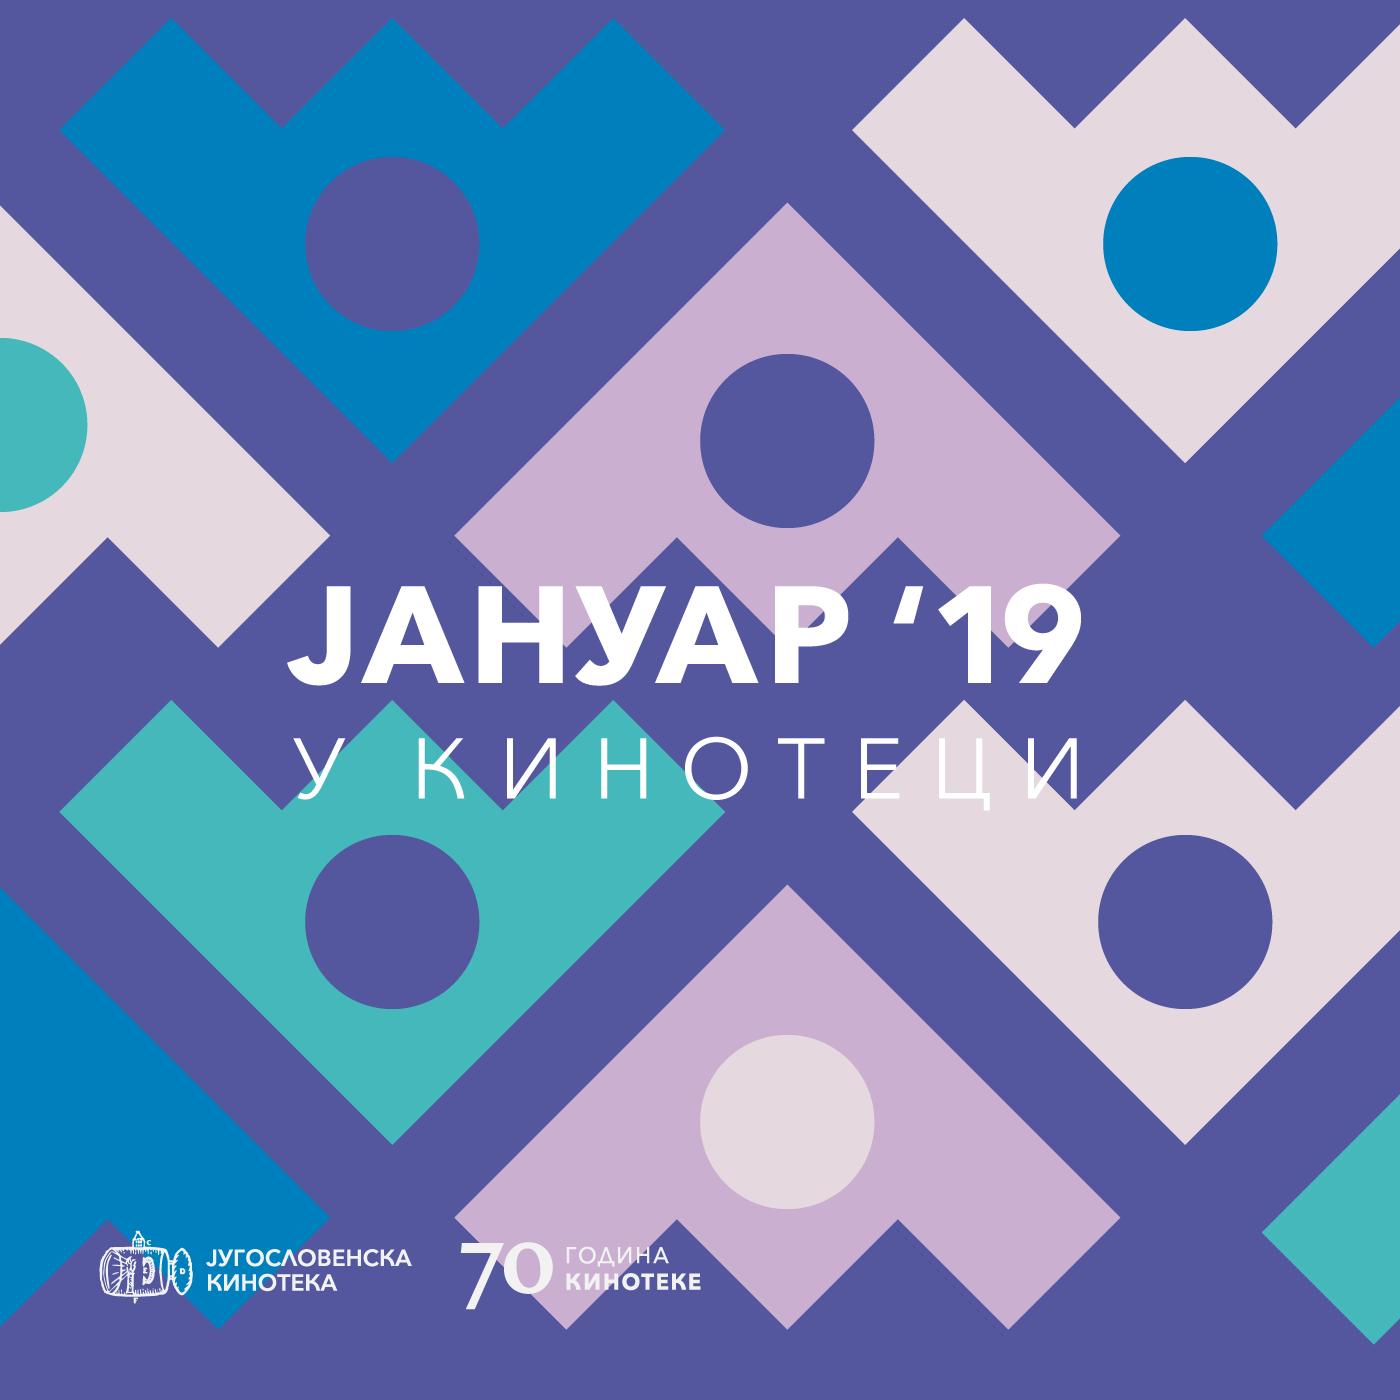 insta-najava-za-jan-2019